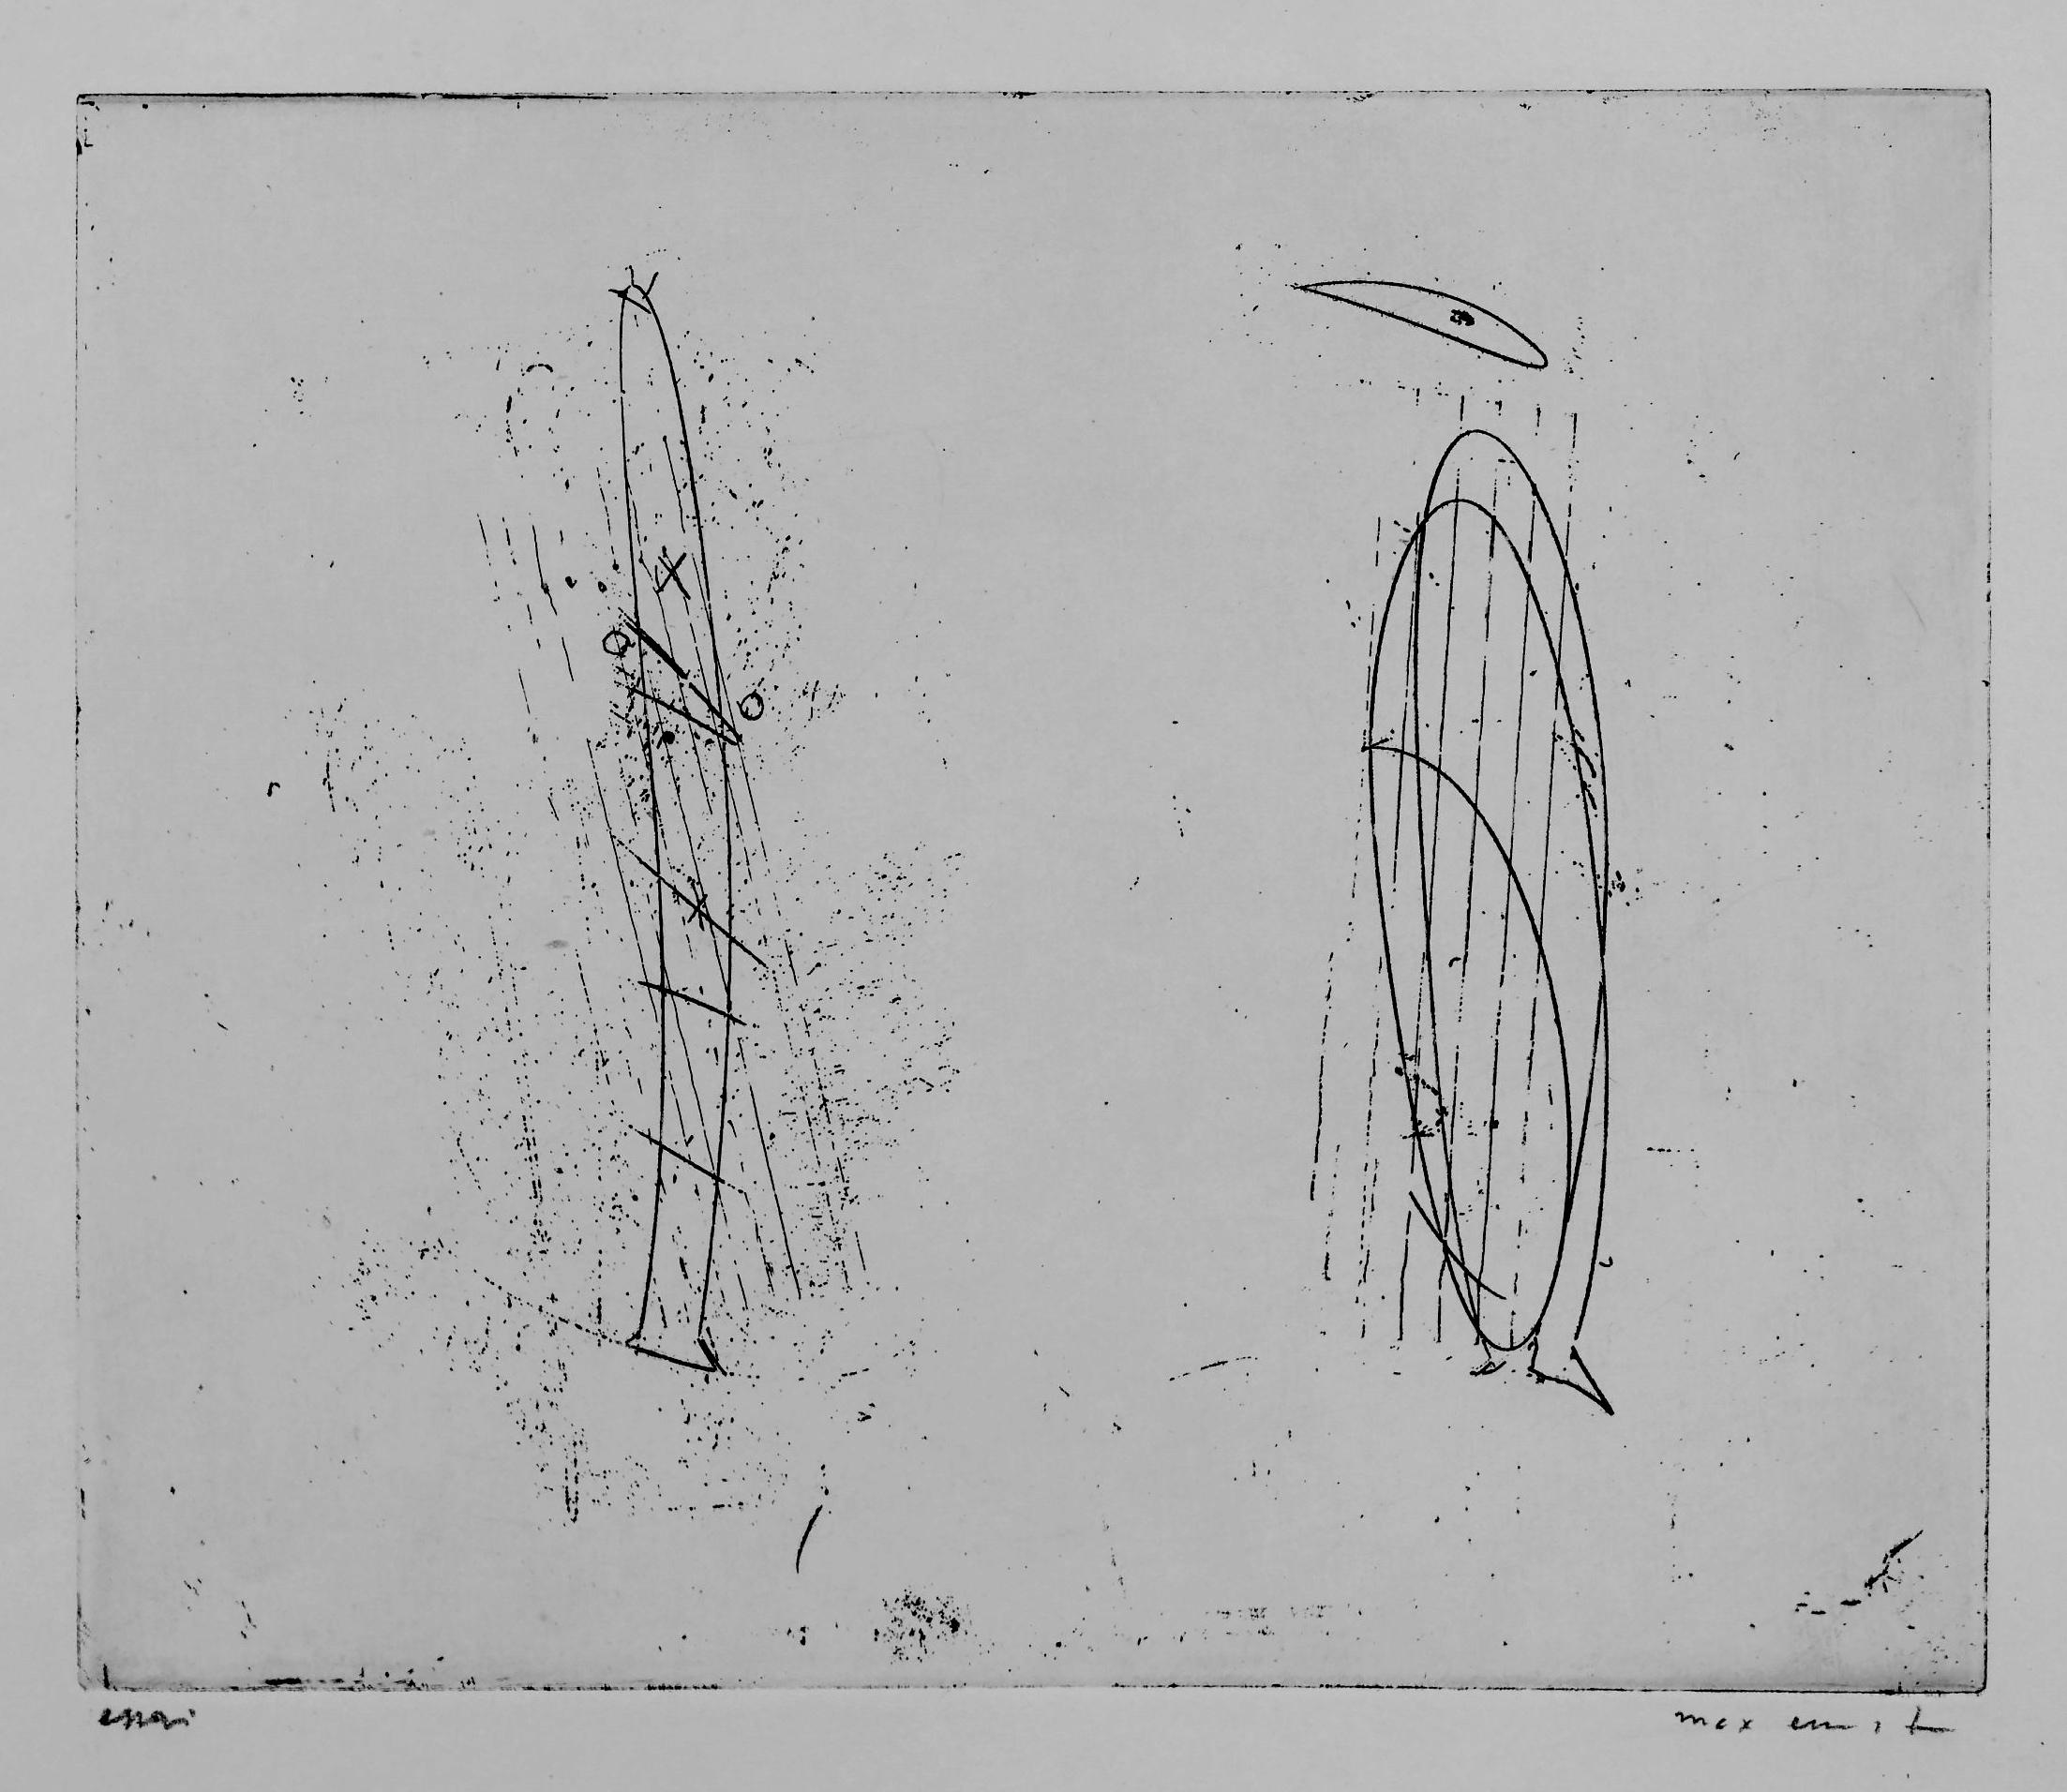 Untitled from Le Poeme de la femme 100 tetes by Max Ernst